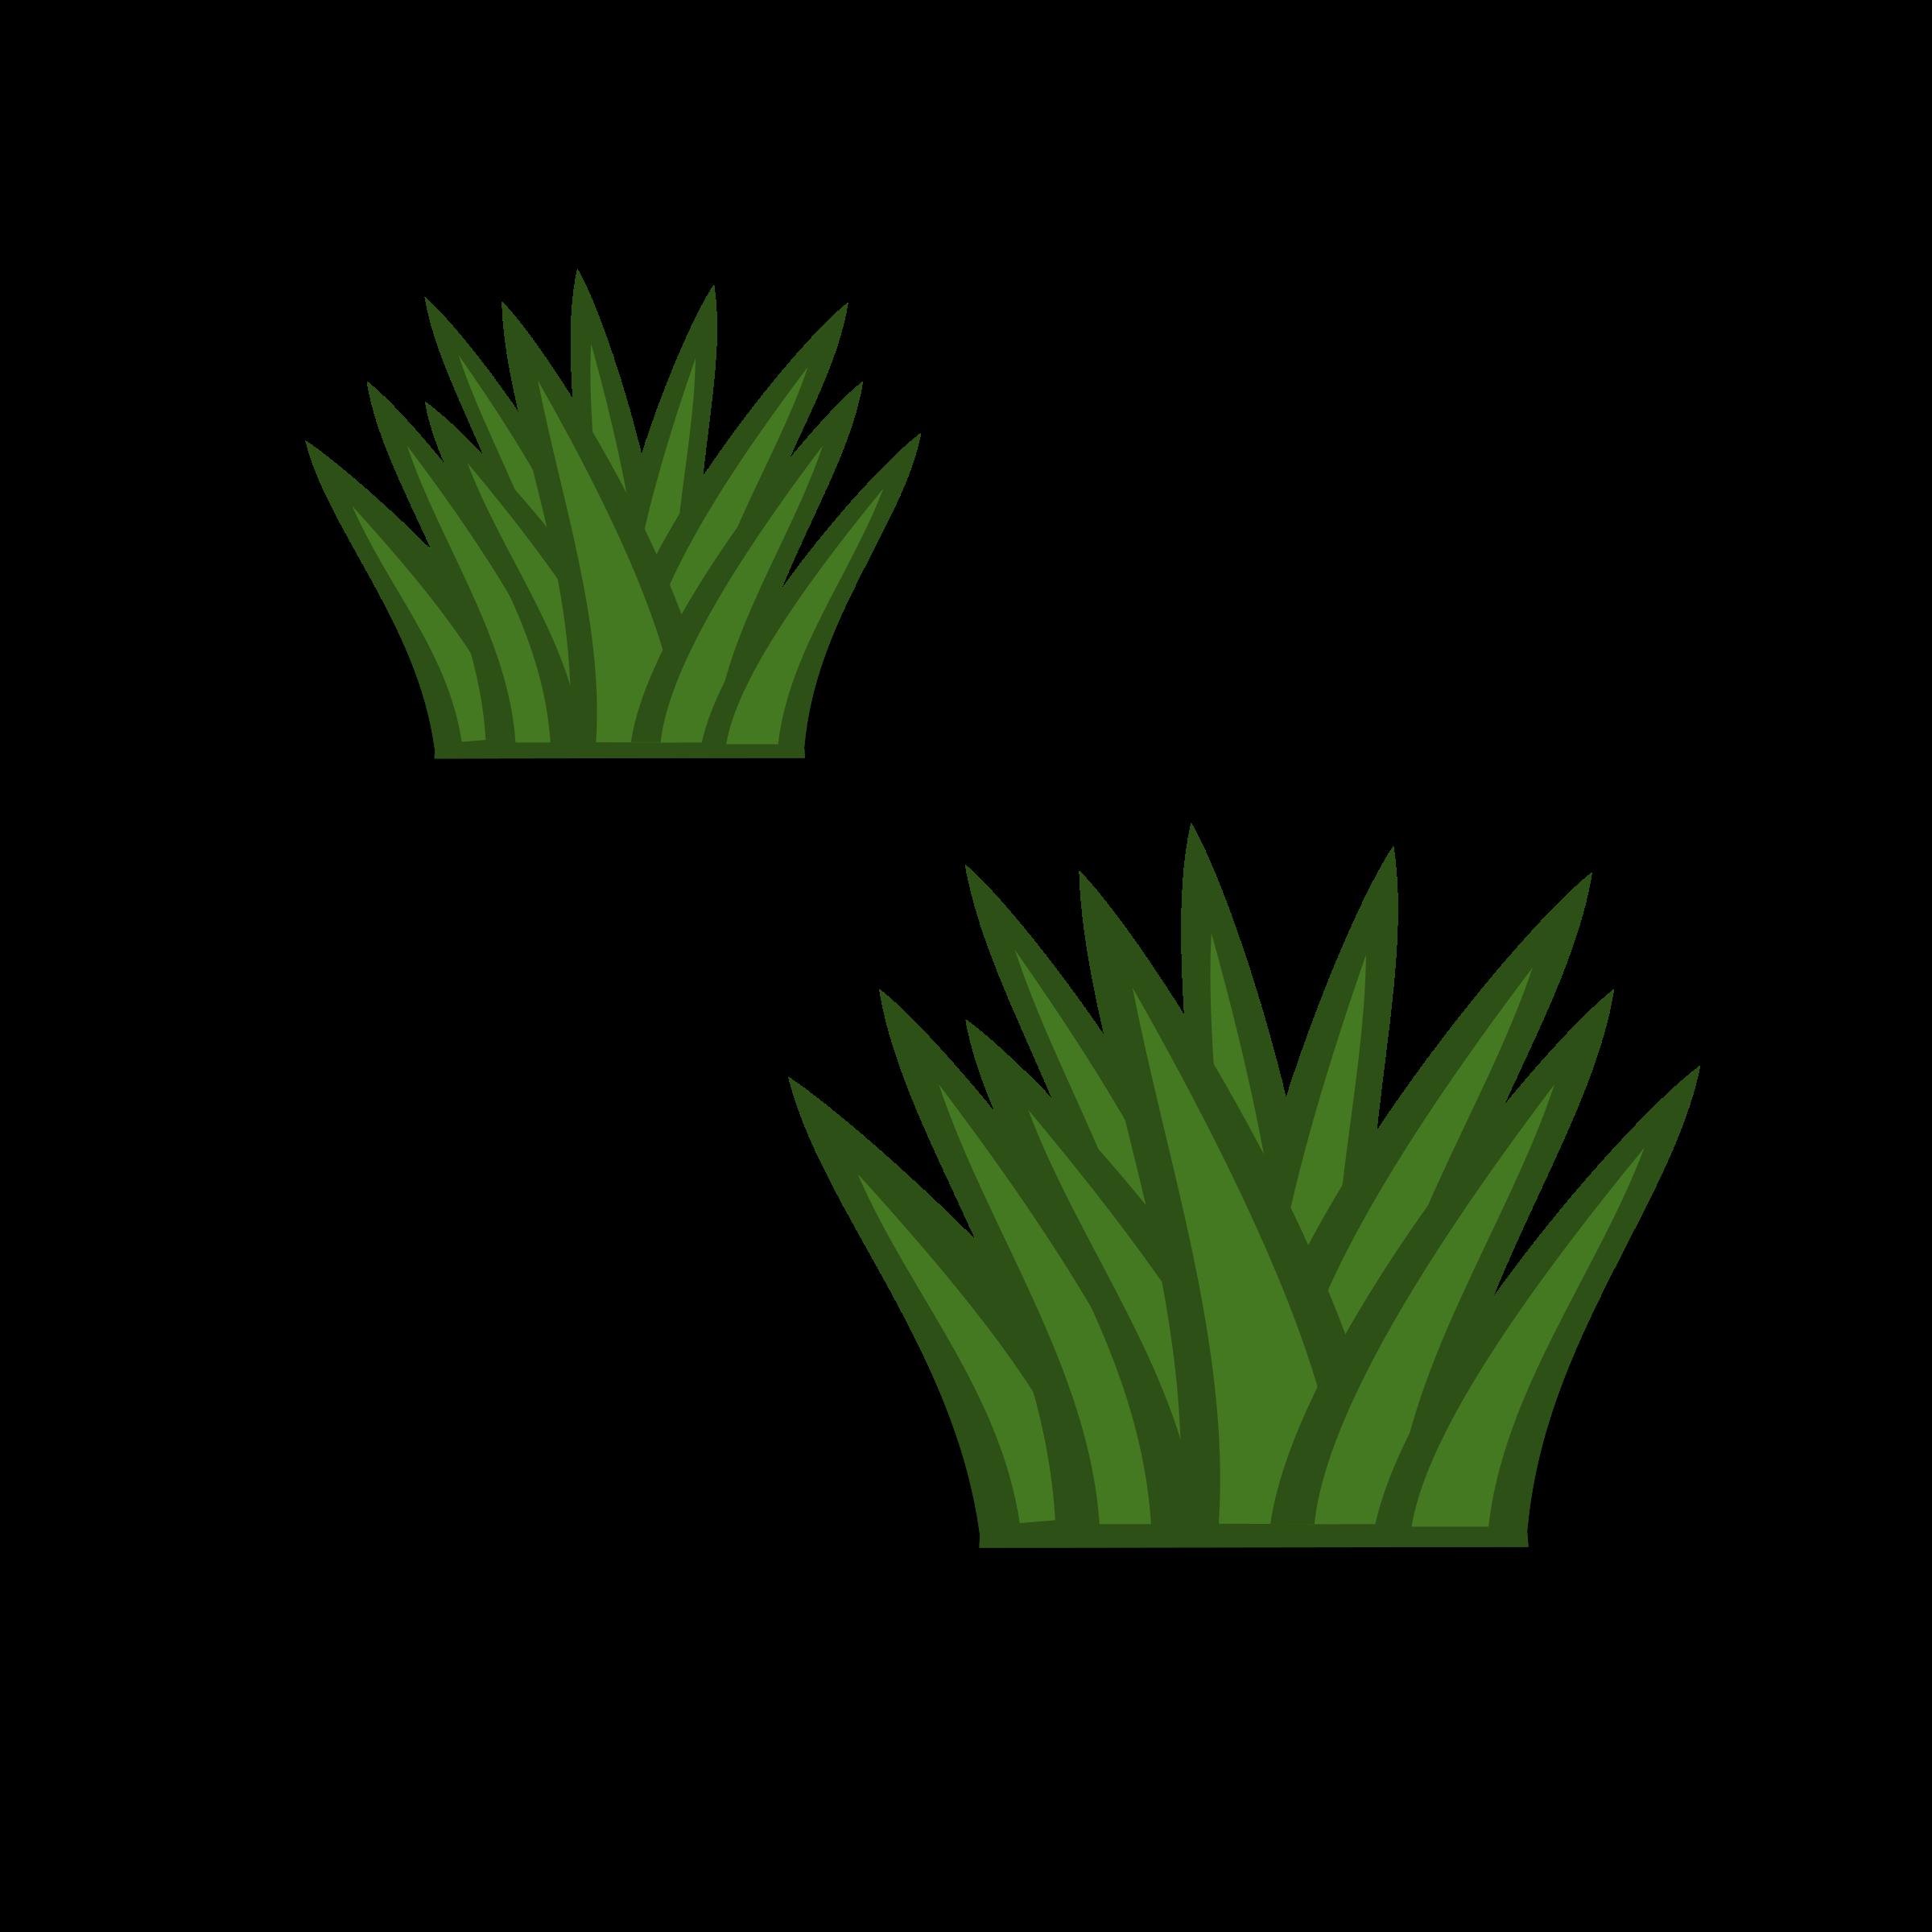 Free Grasslands Cliparts Download Free Clip Art Free